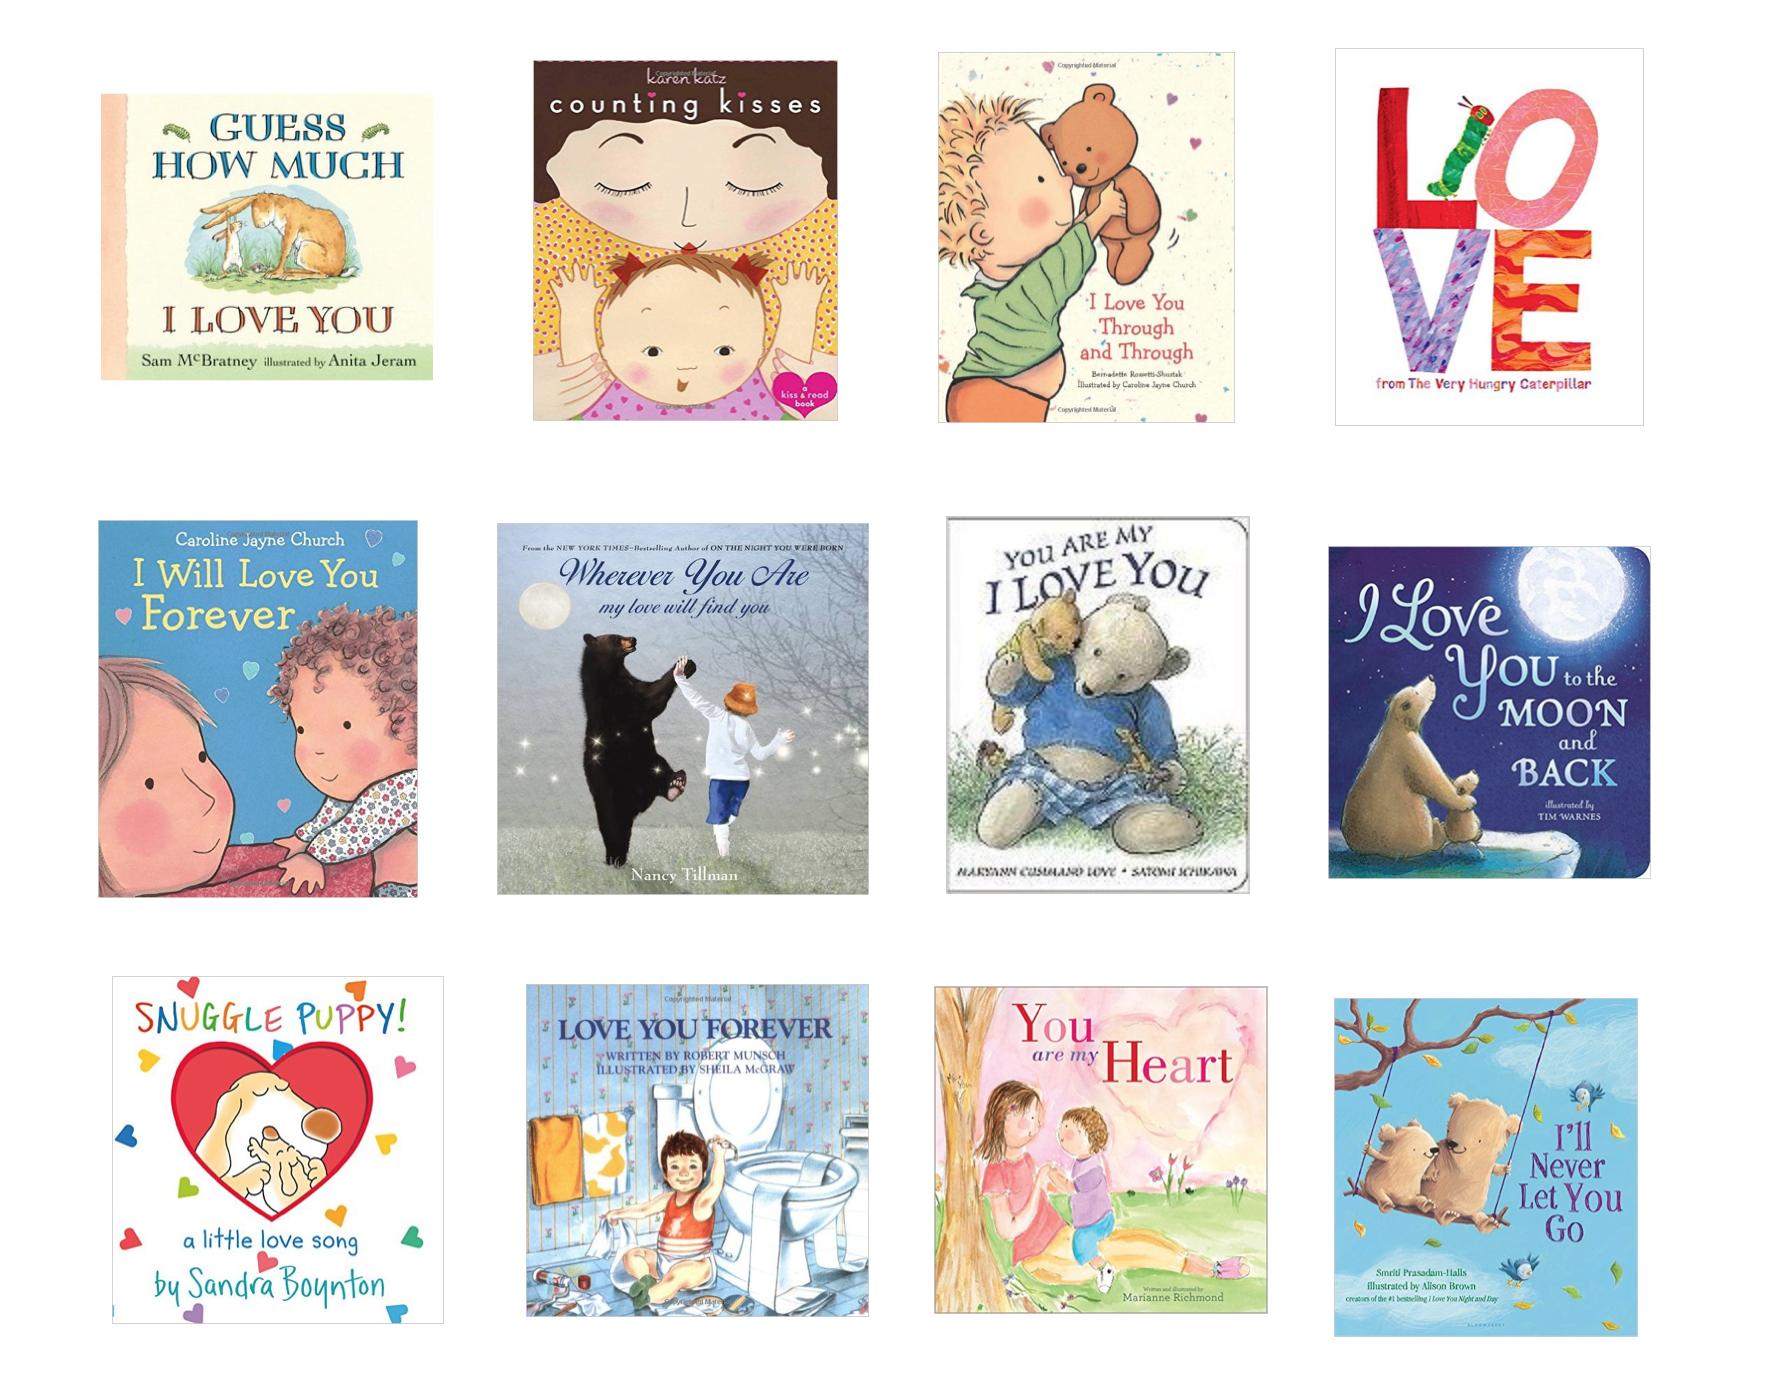 Love-ly Books (Part 2 & 3) — Cristina Toff